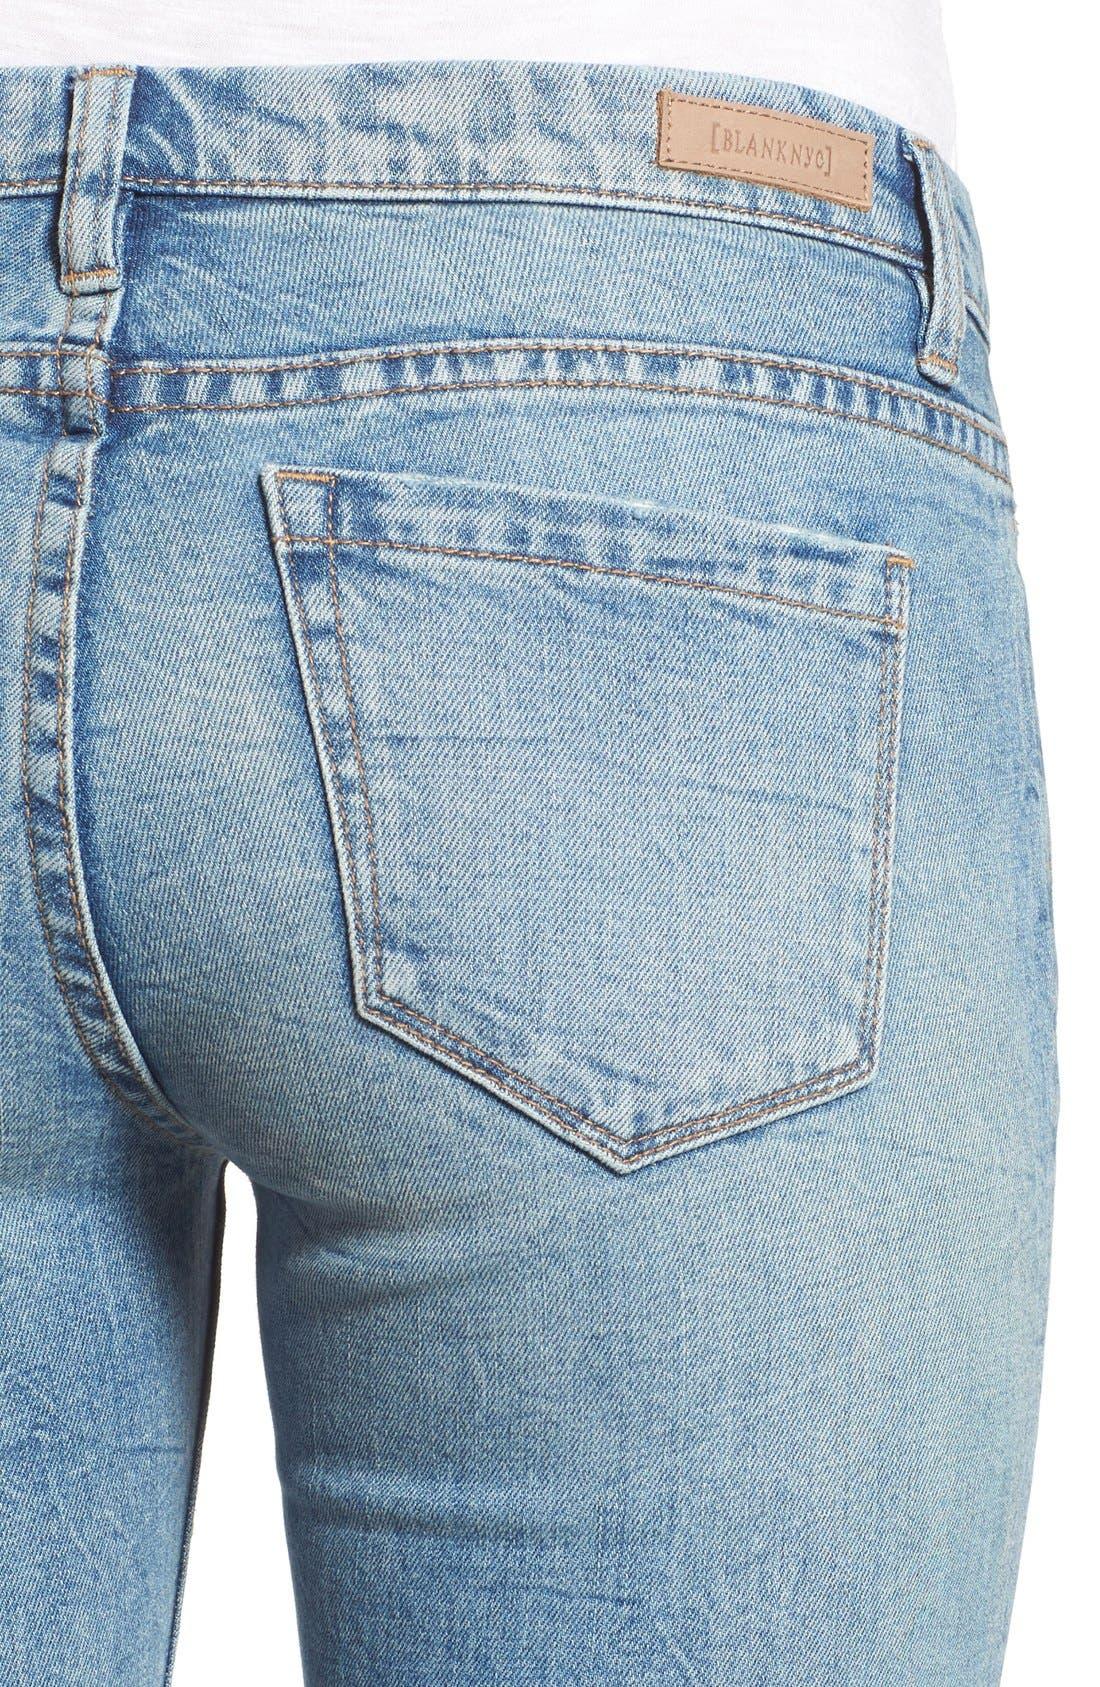 'Skinny Dipper' Distressed Skinny Jeans,                             Alternate thumbnail 2, color,                             400